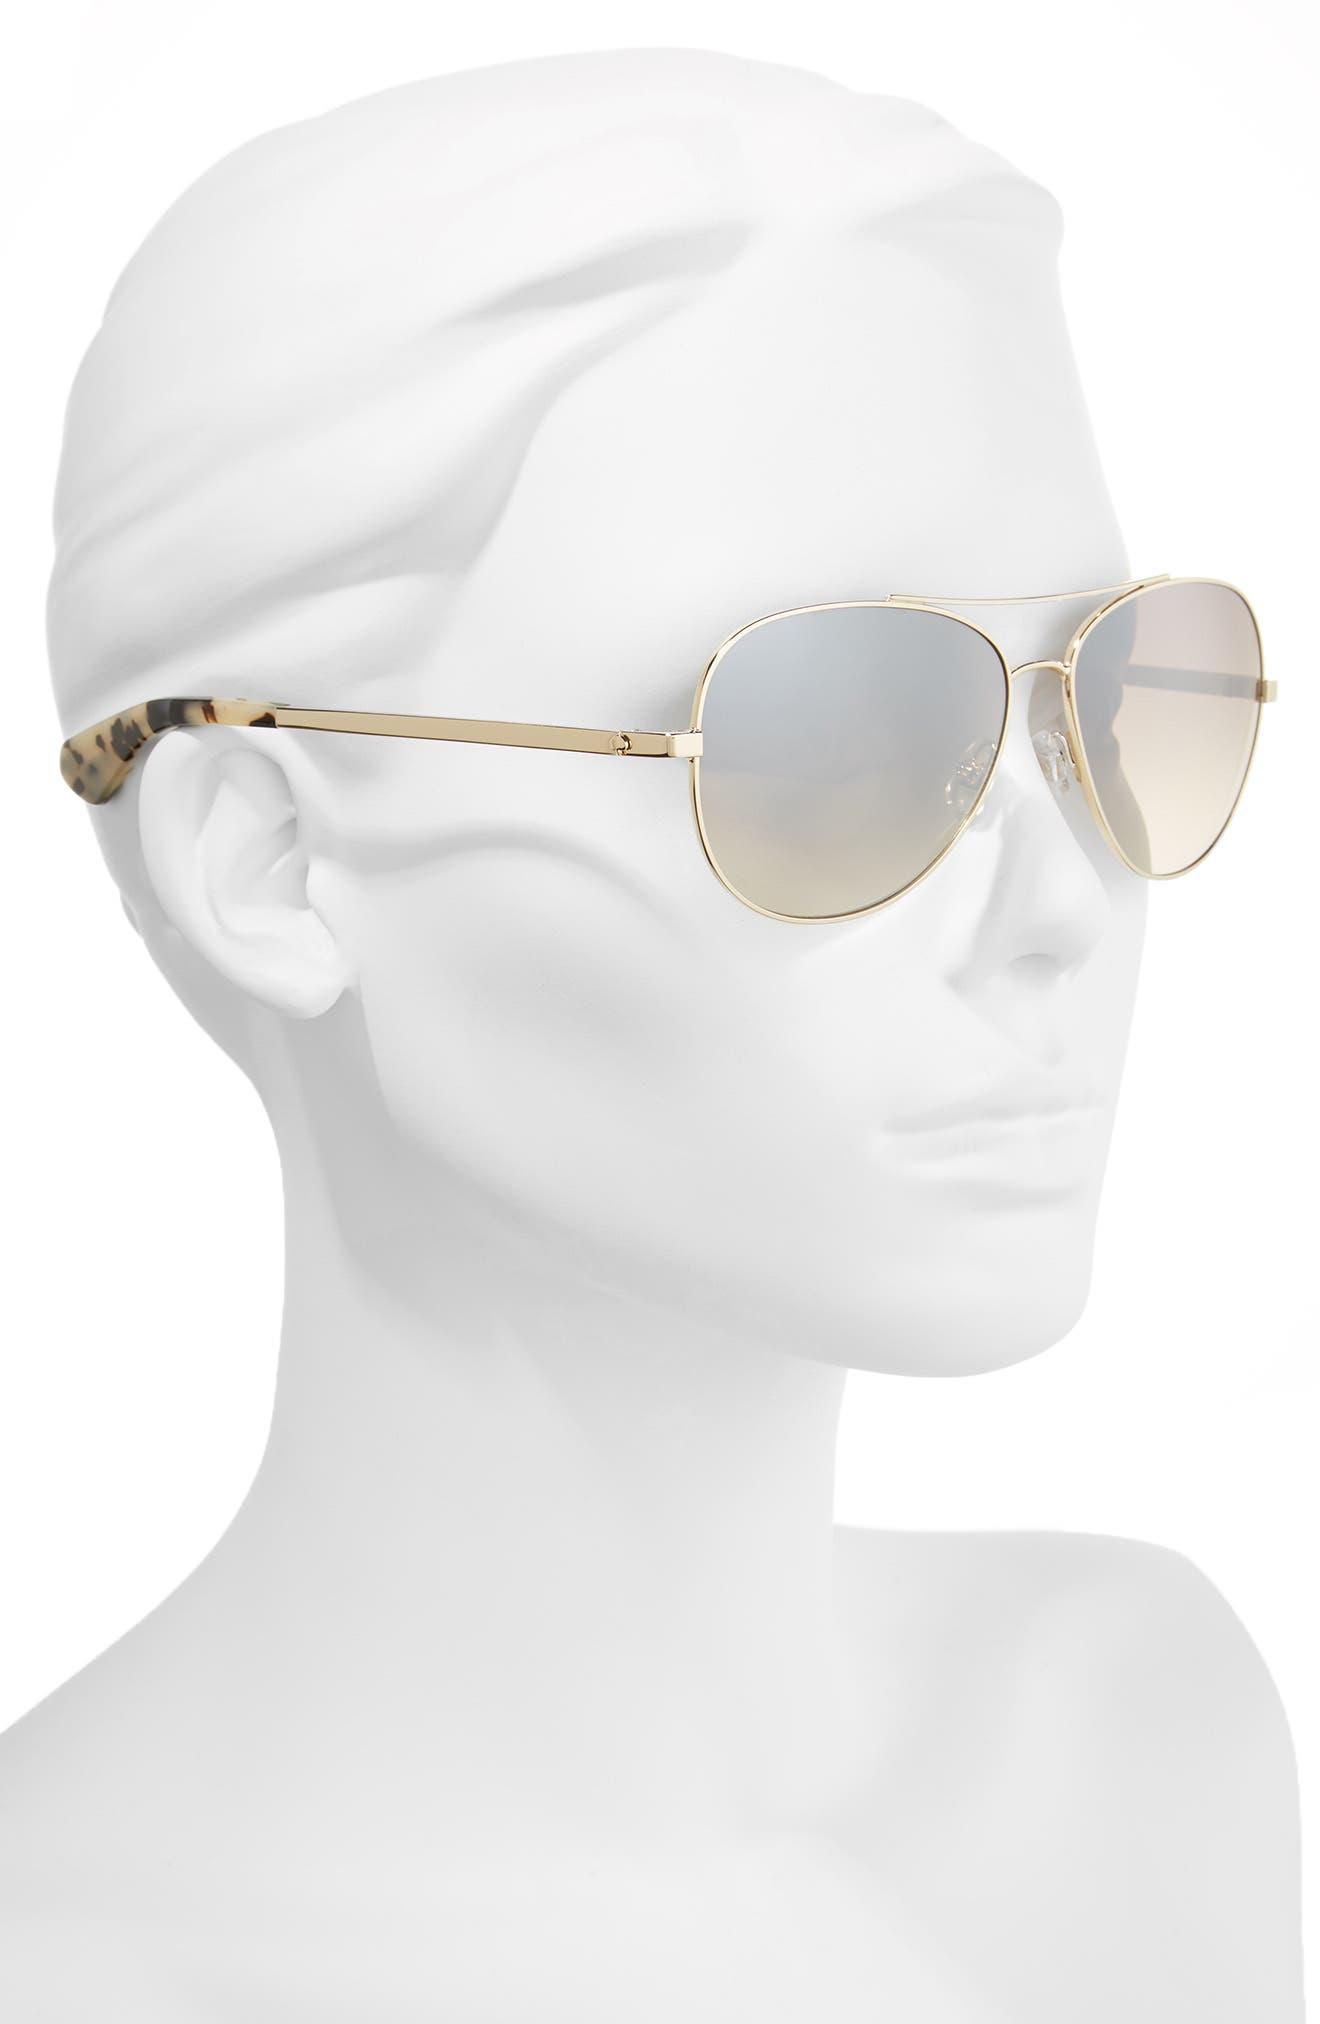 avaline 58mm aviator sunglasses,                             Alternate thumbnail 2, color,                             GOLD HAVANA